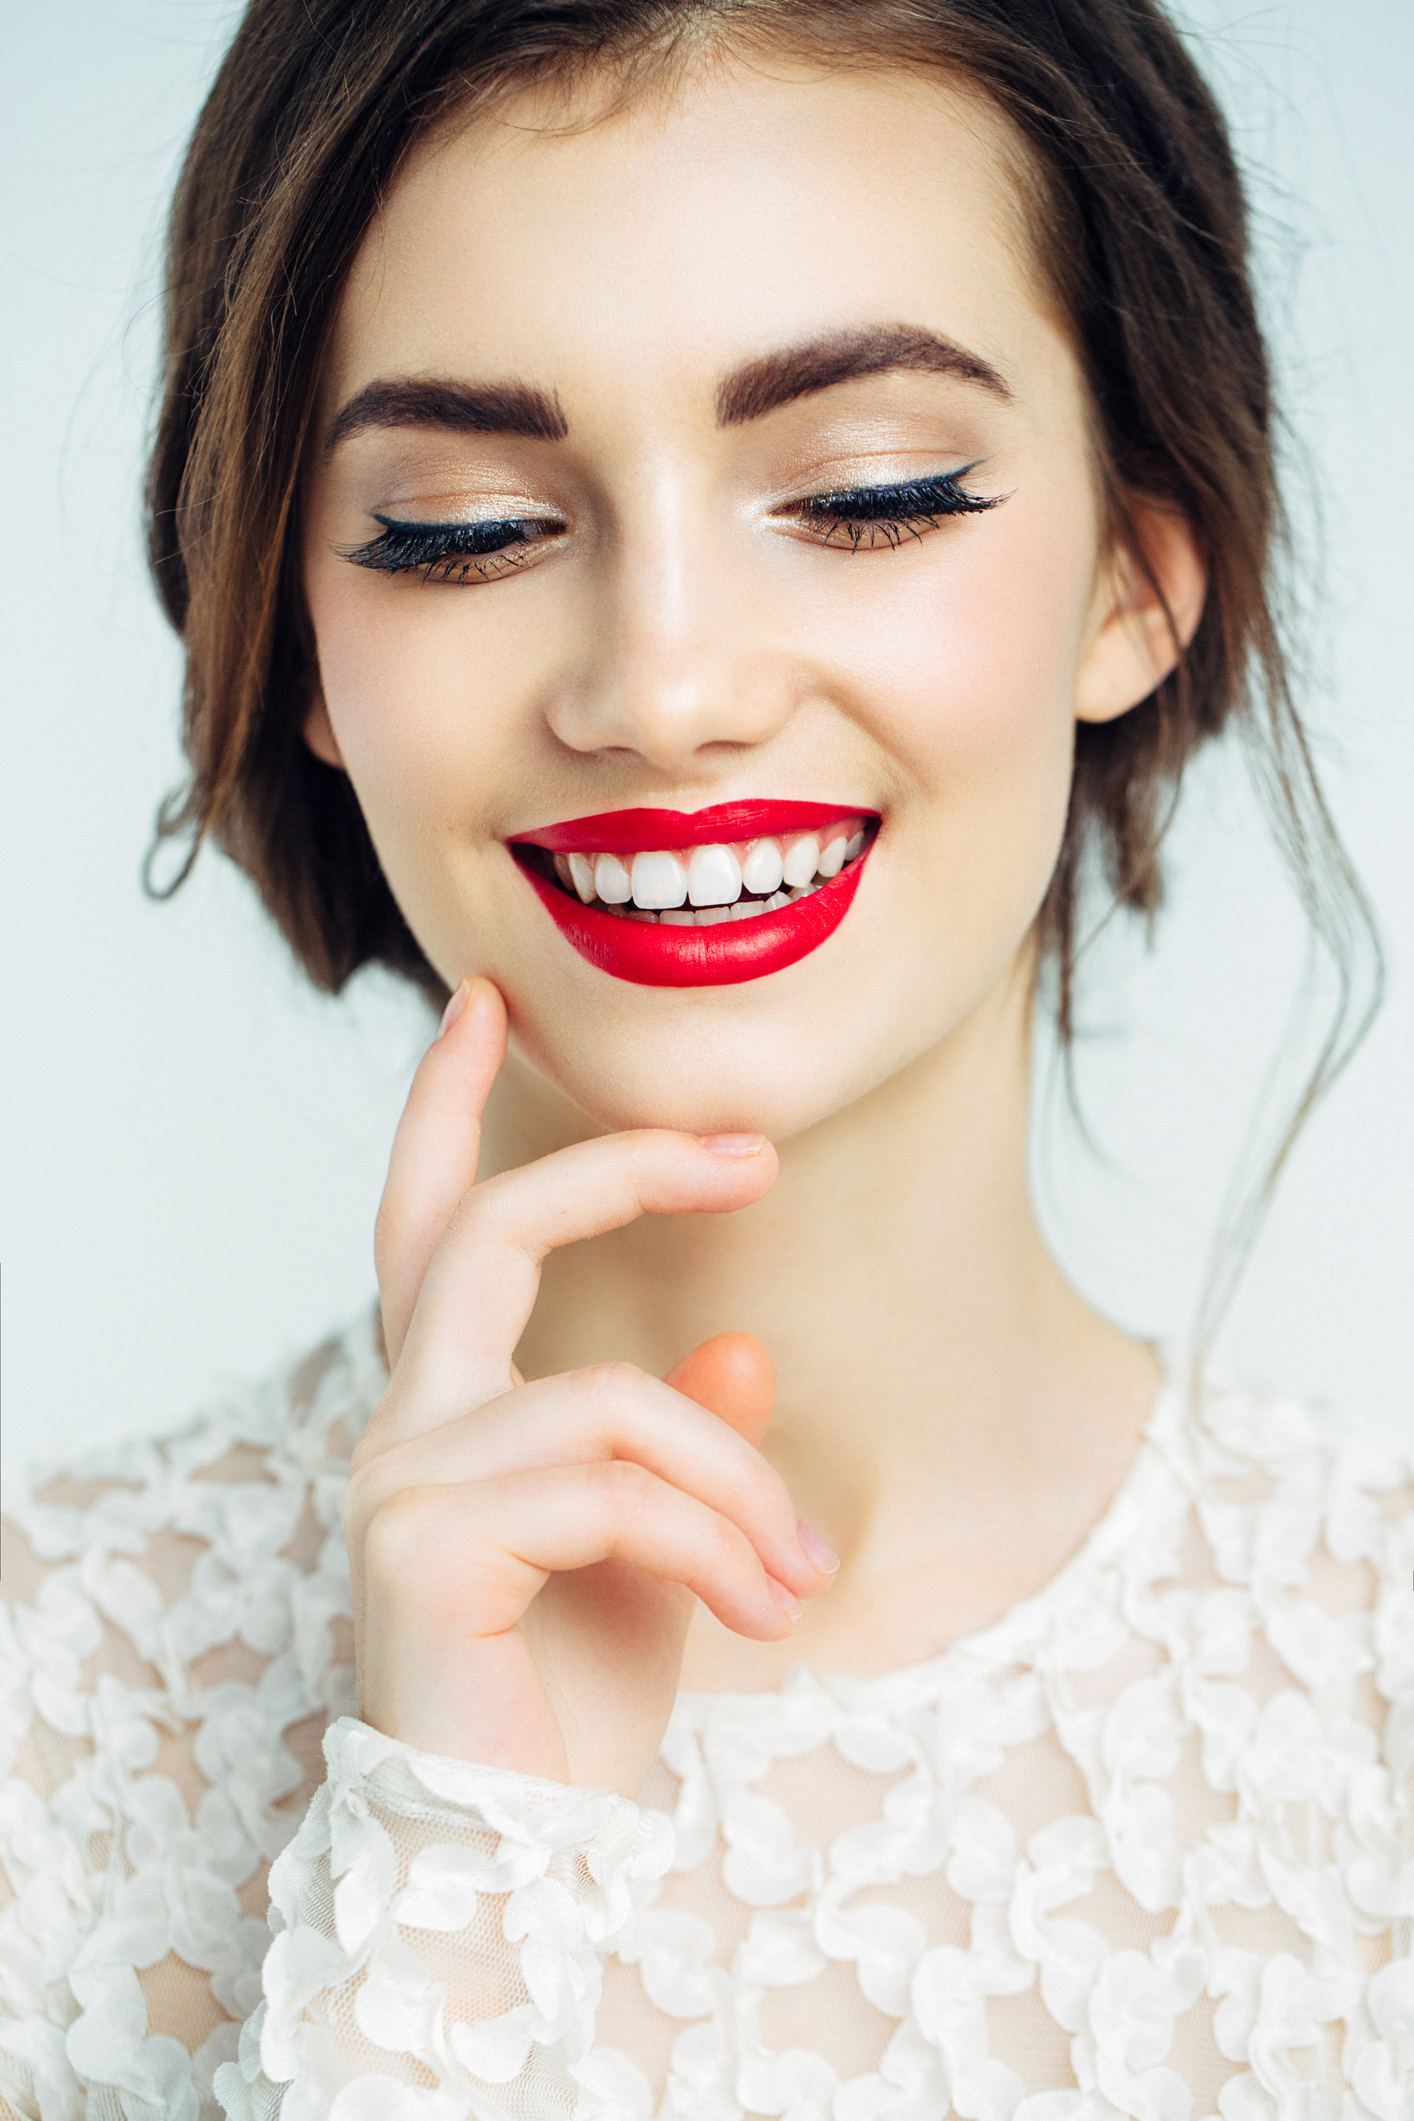 Studio shot of young beautiful woman. Professional make-up